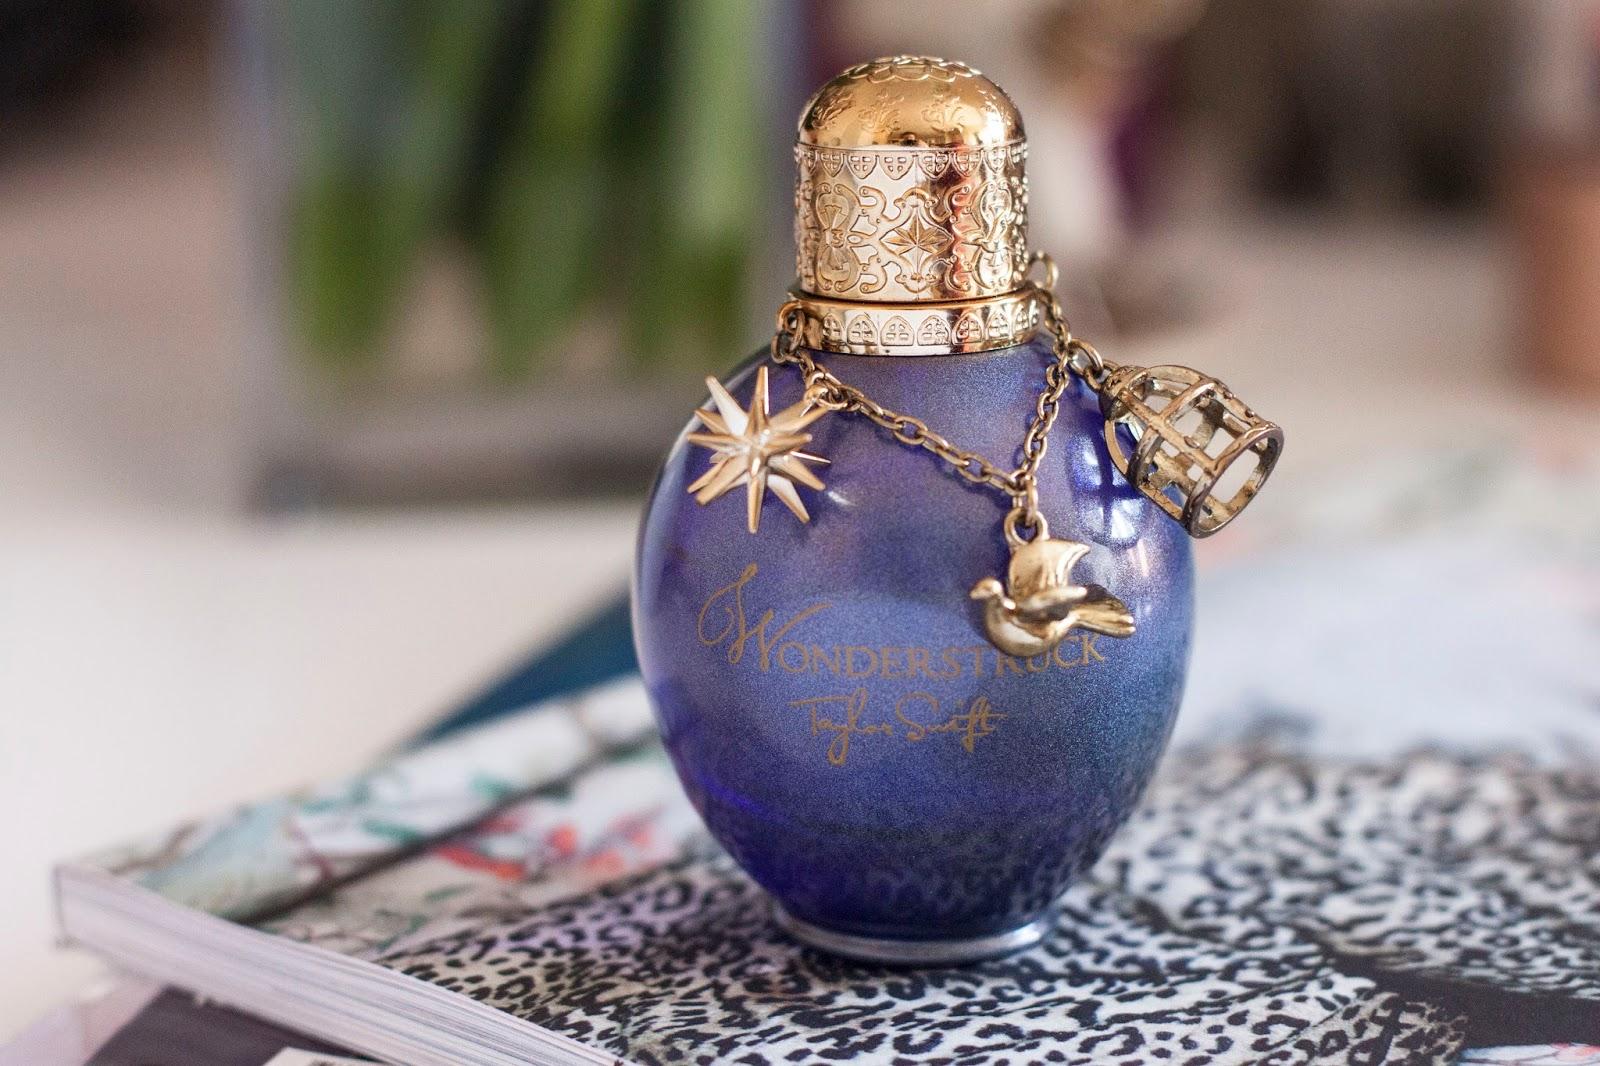 Image of Wonderstruck perfume by Taylor Swift